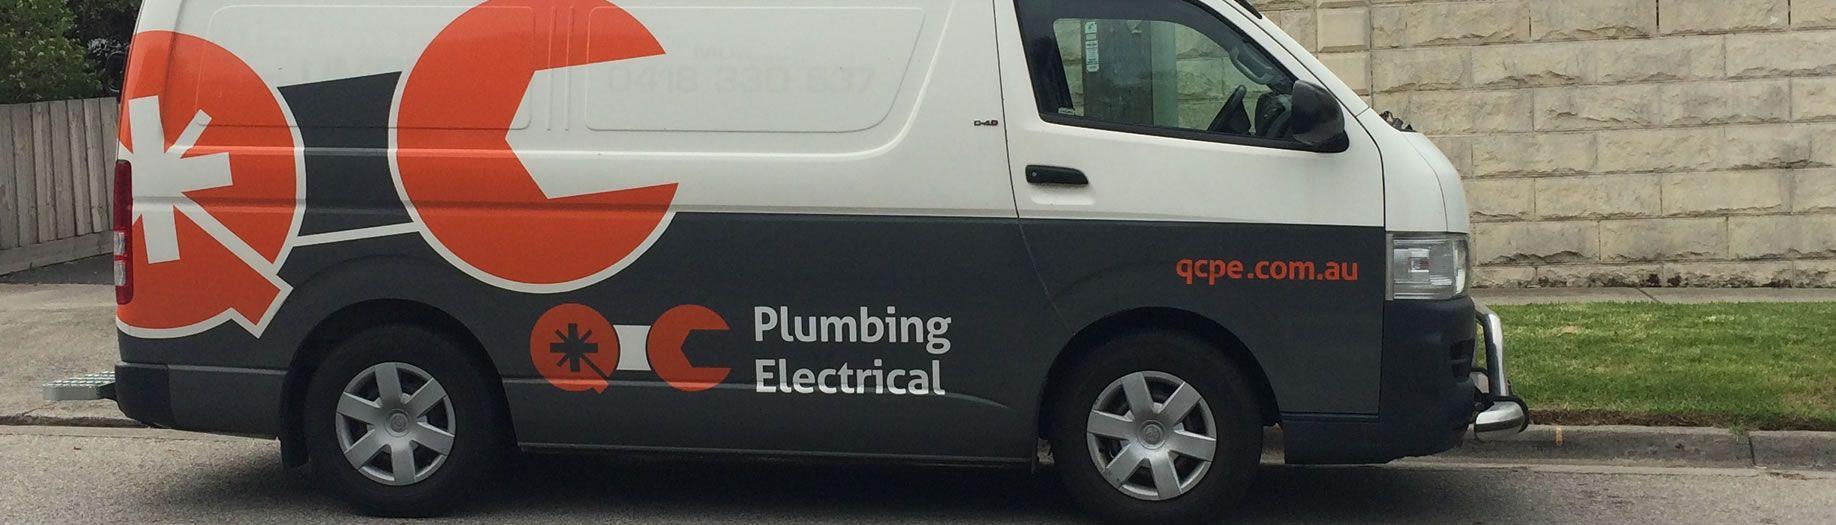 QC Plumbing and Electrical Van